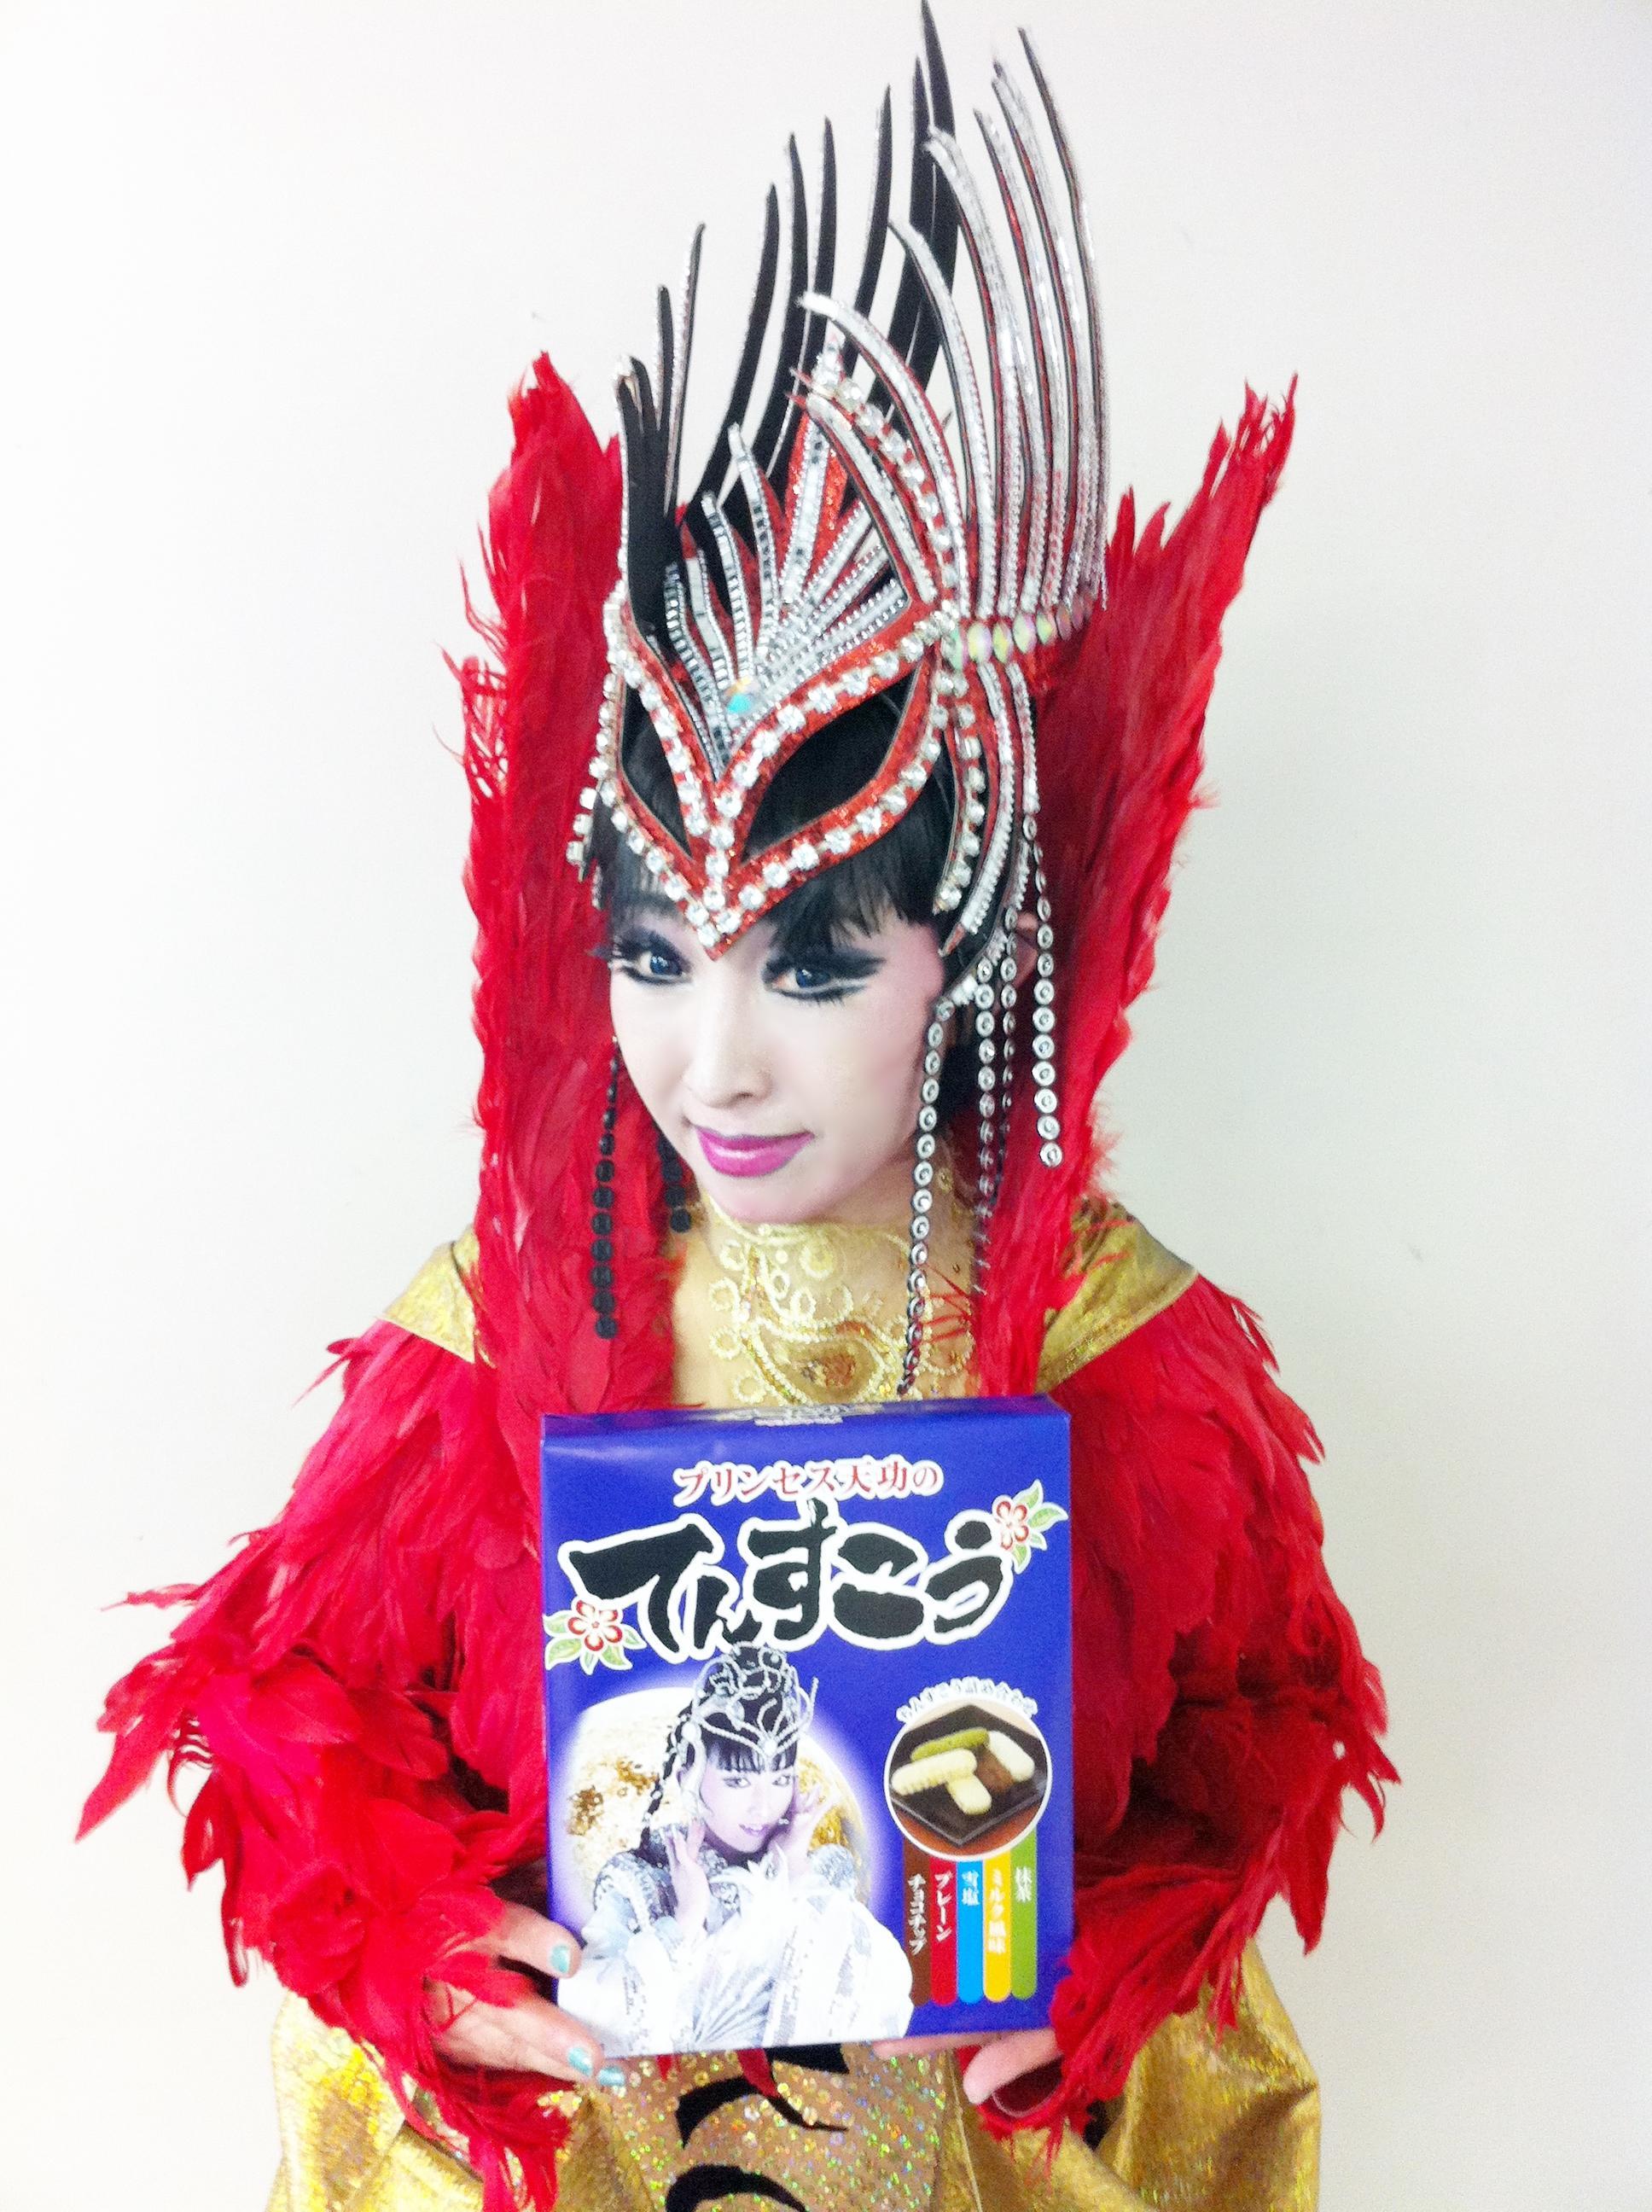 http://news.yoshimoto.co.jp/20151208163028-077db97340706b3ec3946726b52481965f6dd964.jpg